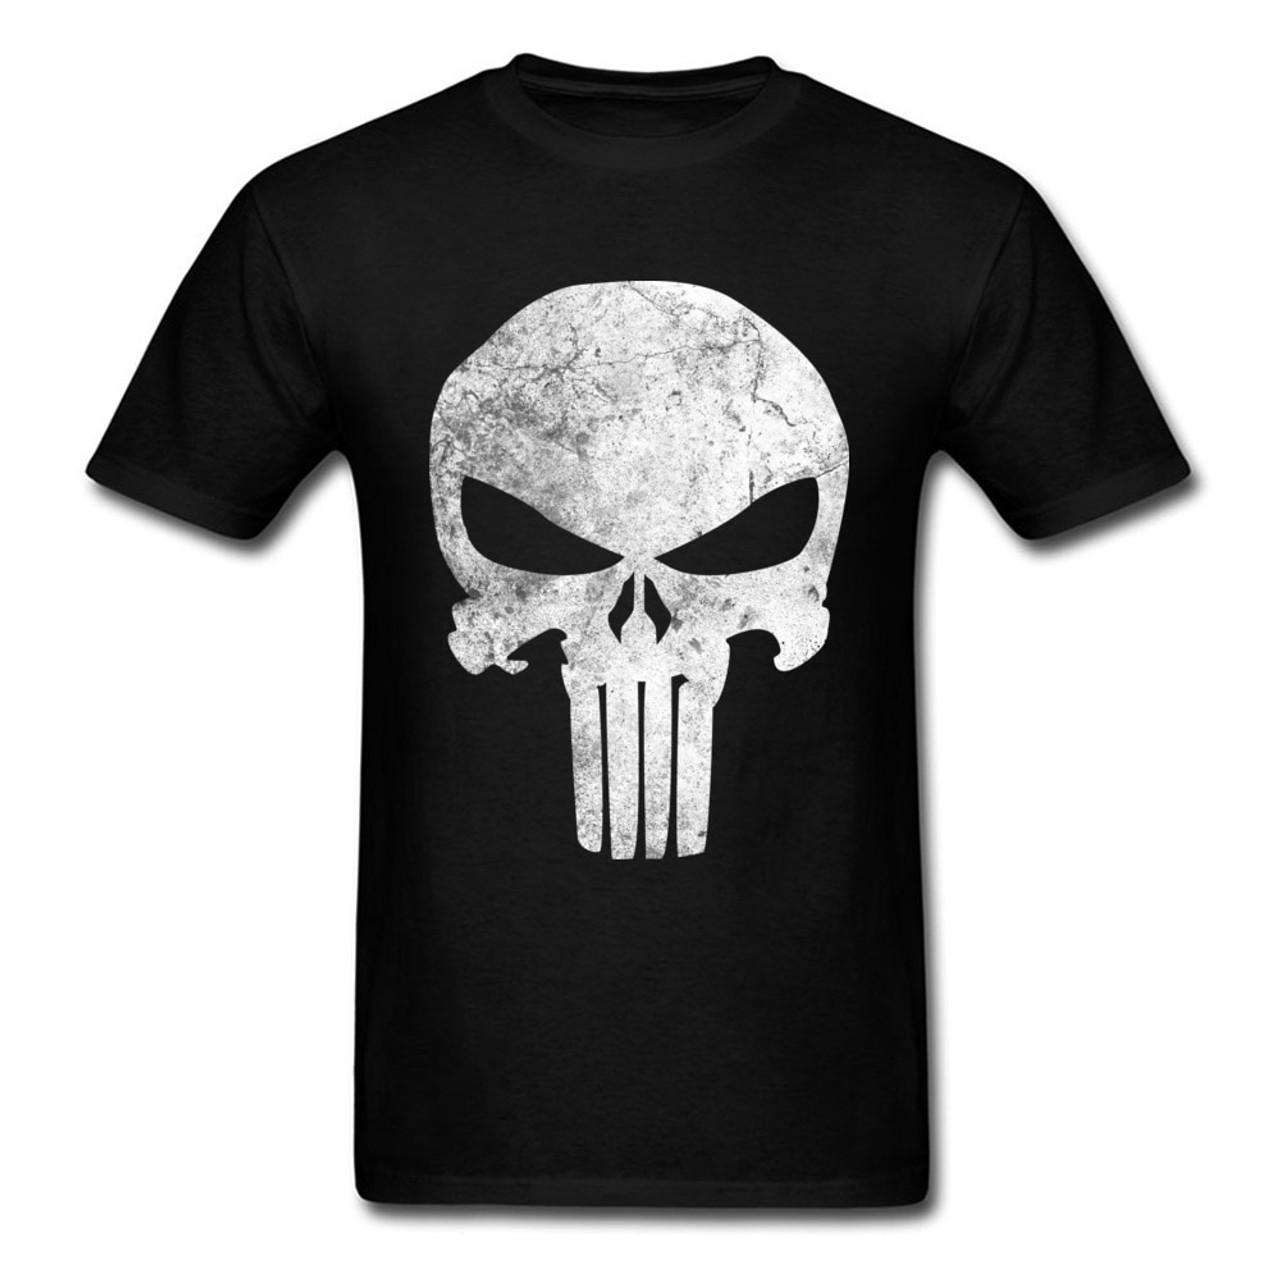 eae6a6b39 Punisher Skull T-shirt Grunge Skulls Print T Shirt Marvel Men Tshirt  Vintage Art Clothes Design Hipster Tops Team Tees Cotton